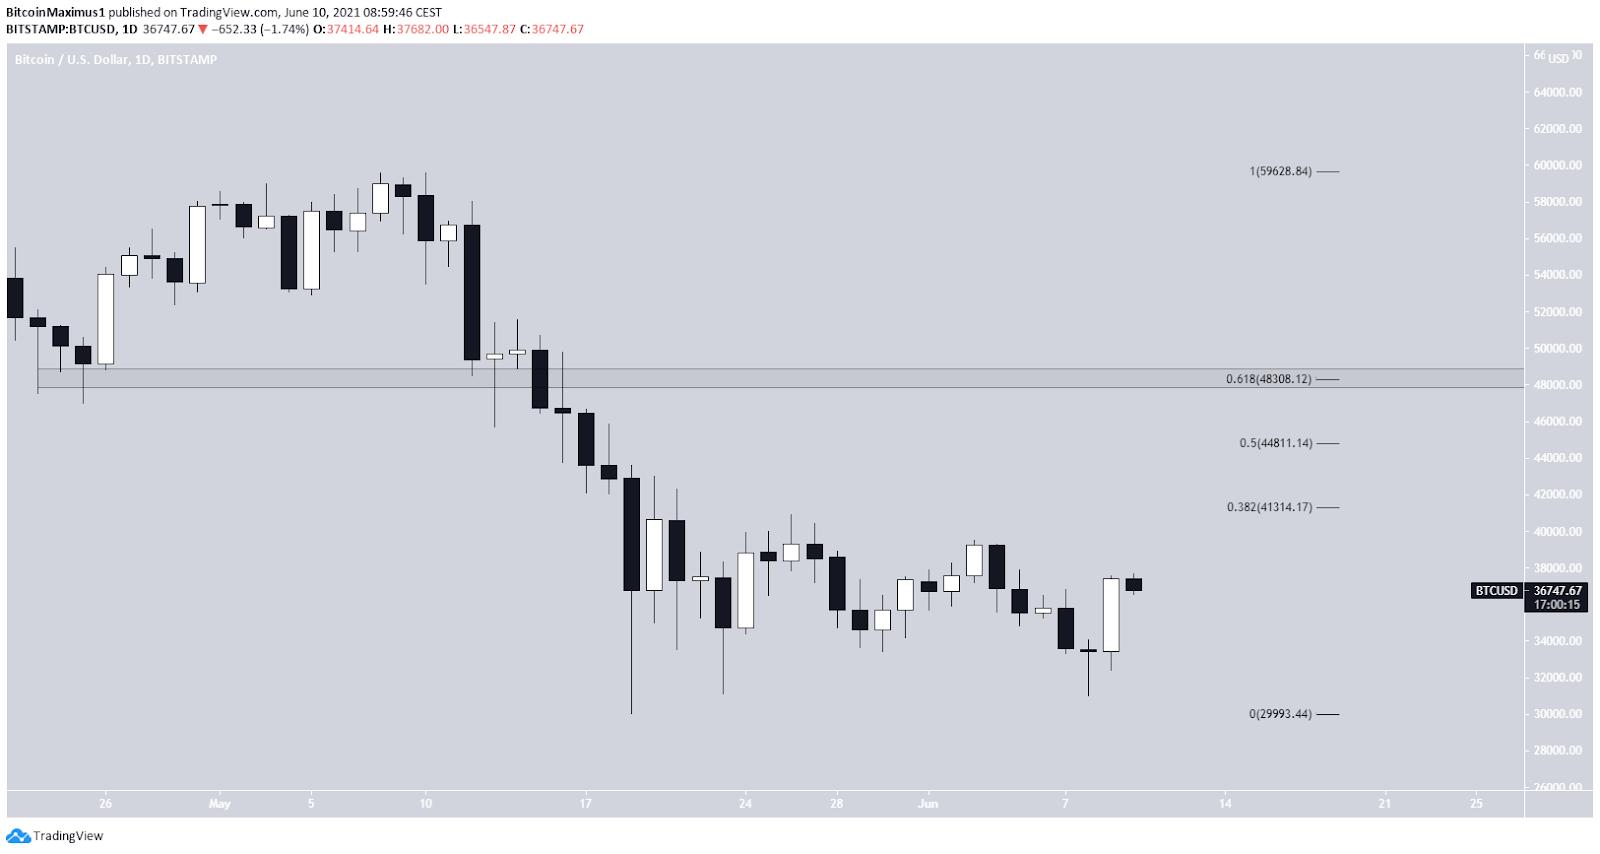 Bitcoin Preis Kurs Chart BTC Tagesansicht Tradingview 10.06.2021 2